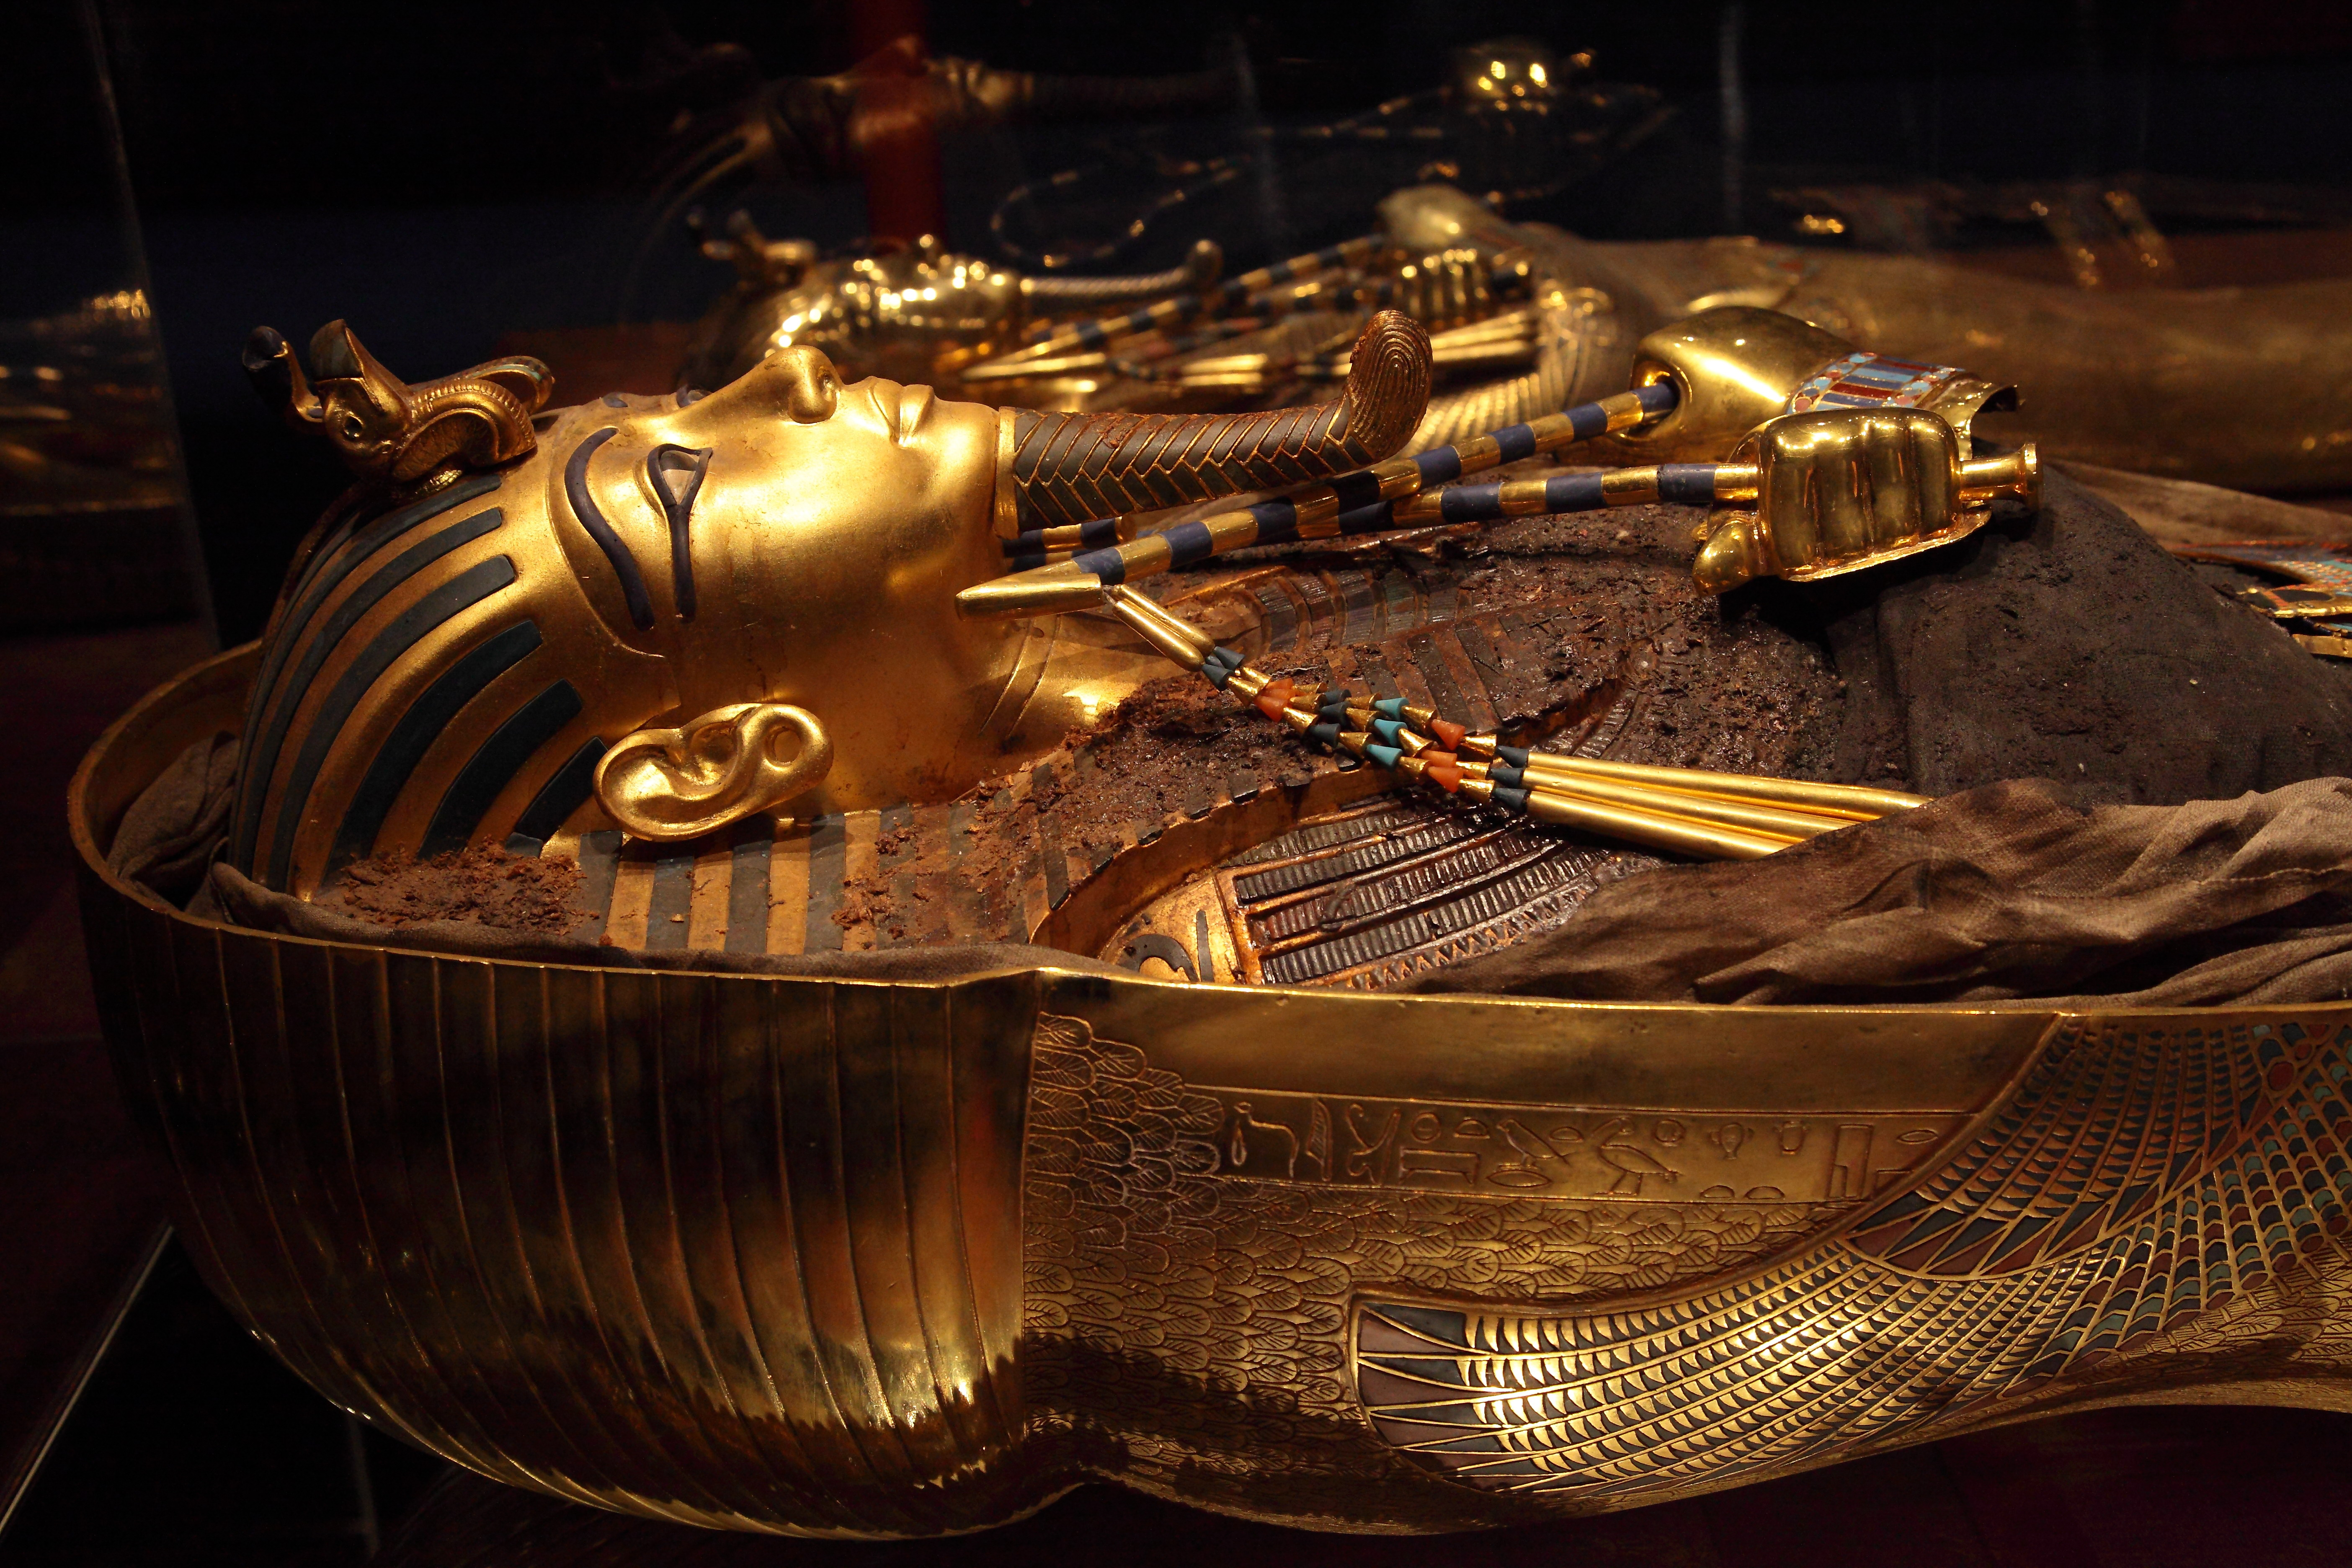 king-tut-golden-mummy-cases-04